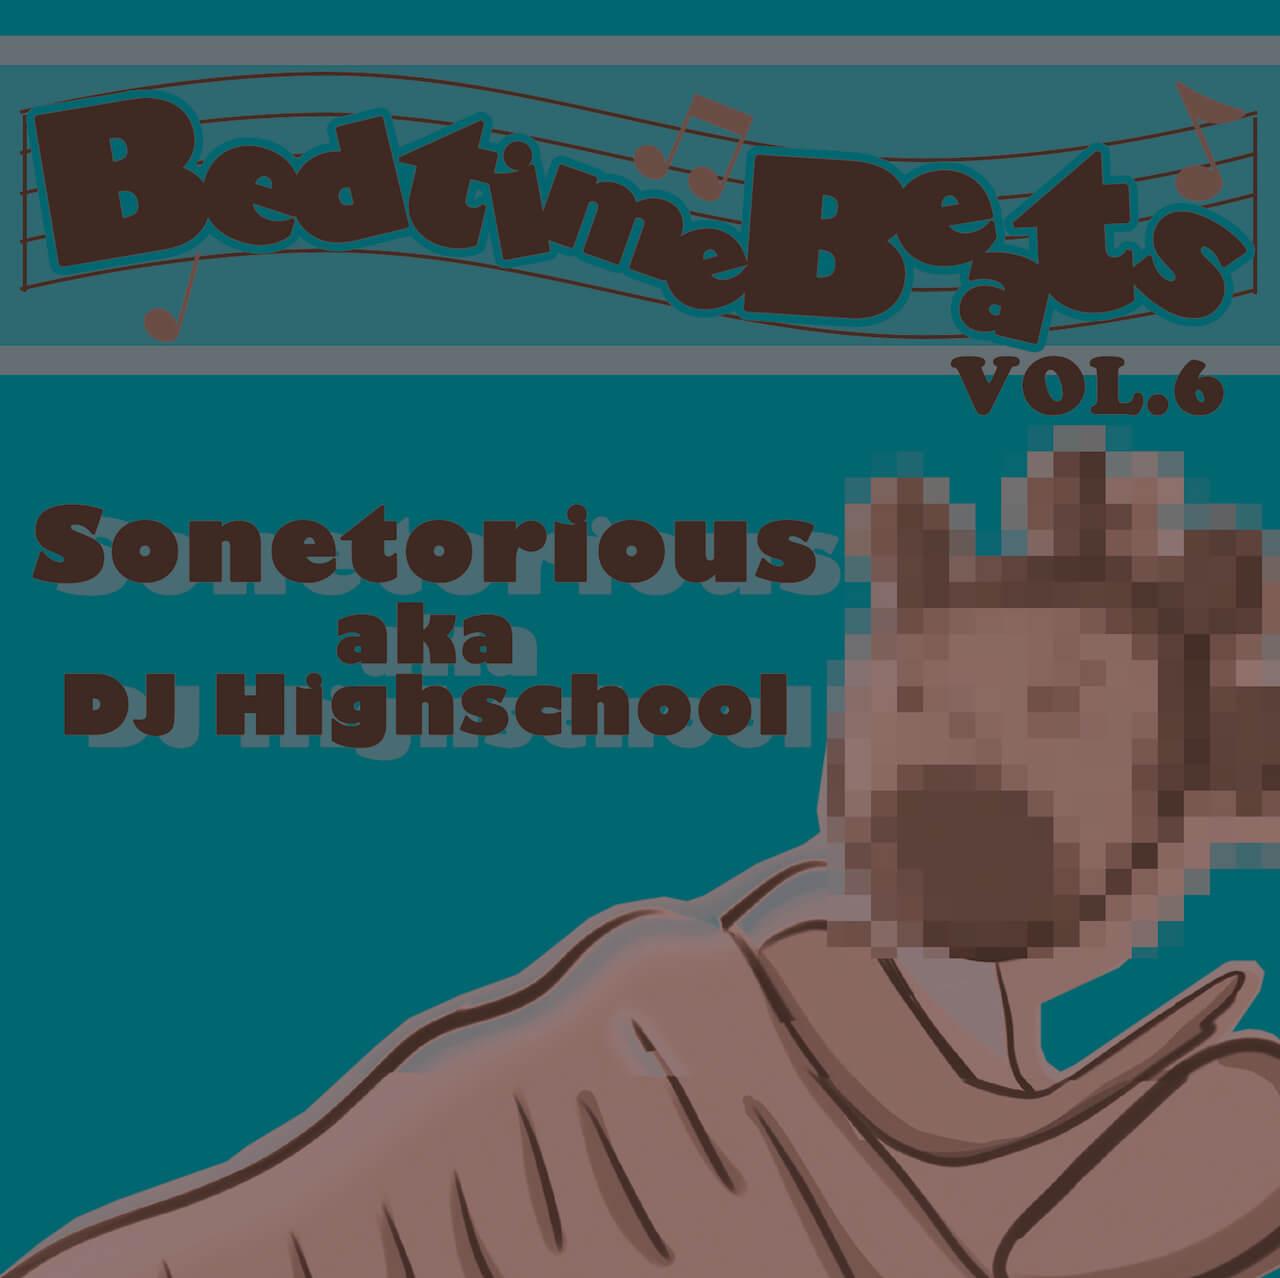 DJ HIGHSCHOOLによるライフワーク的ビート集「BEDTIME BEATS」VOL.6がBandcampにてリリース music200428-djhighschool